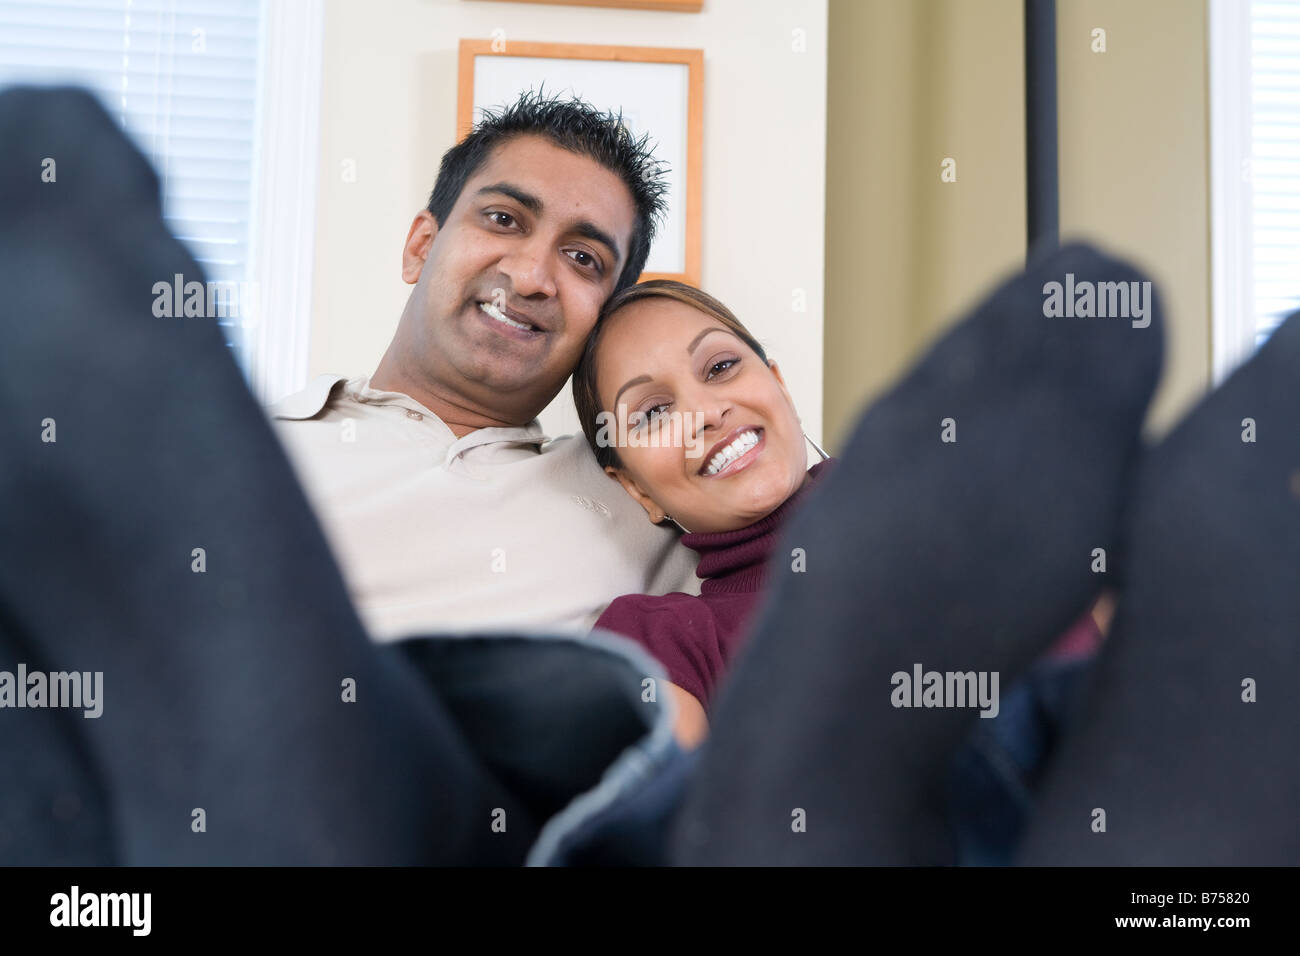 Man and woman with feet up toward camera, Winnipeg, Canada - Stock Image